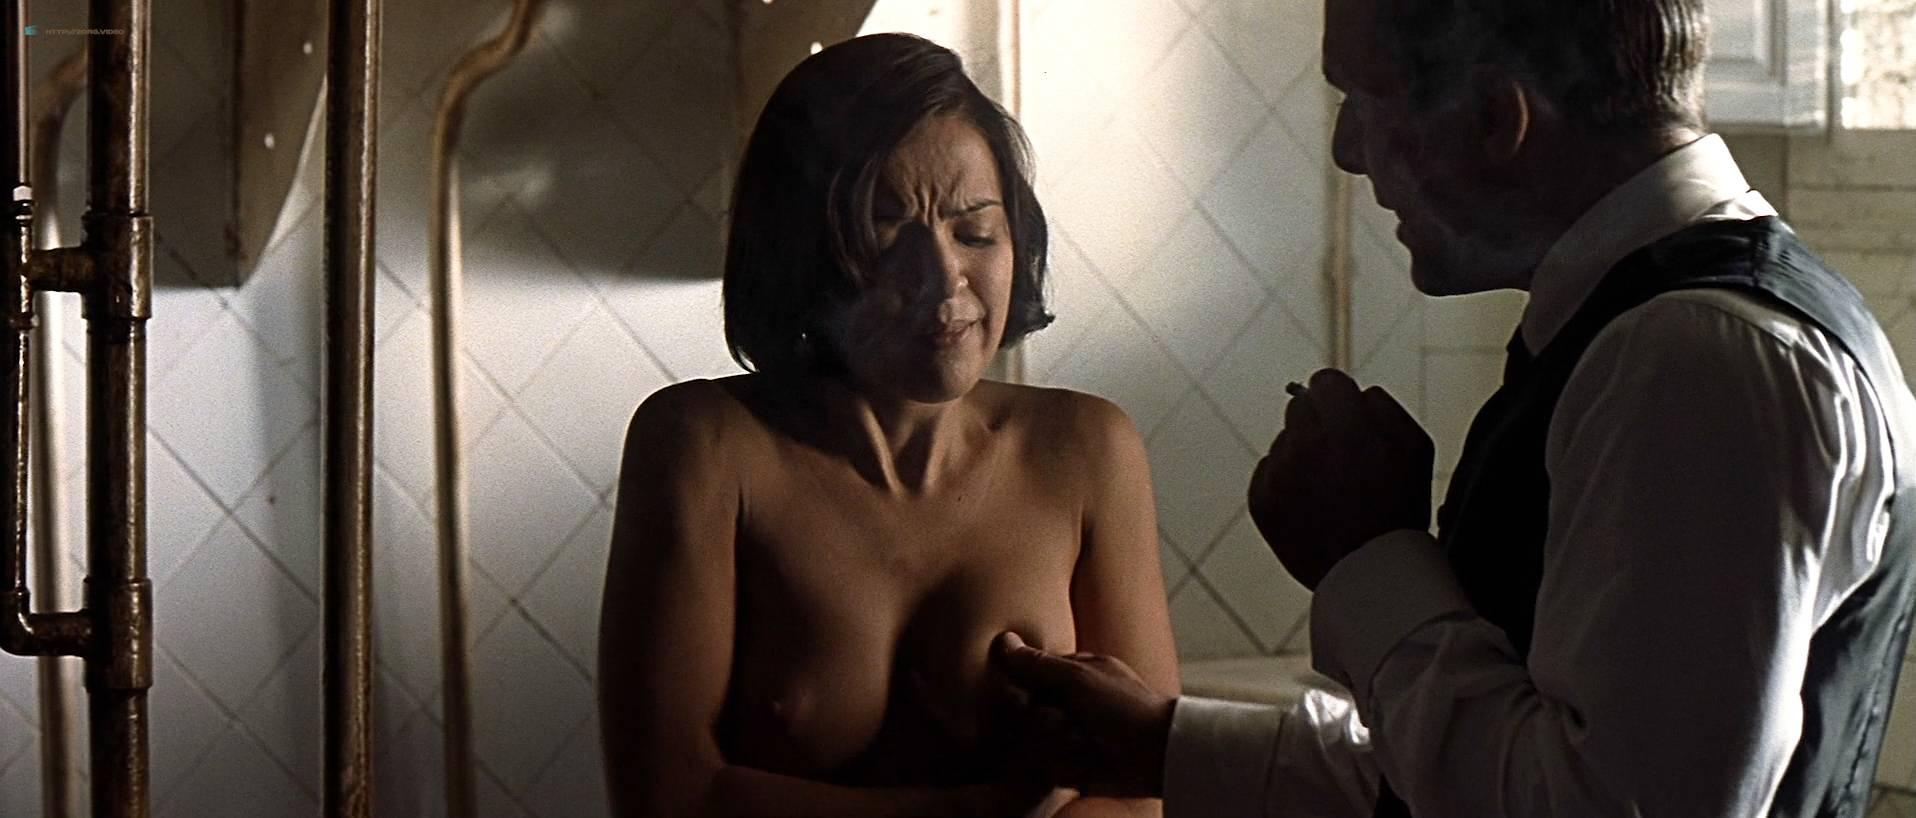 Verónica Sánchez nude topless and butt - Las 13 rosas (ES-2007) HD 1080p BluRay (6)